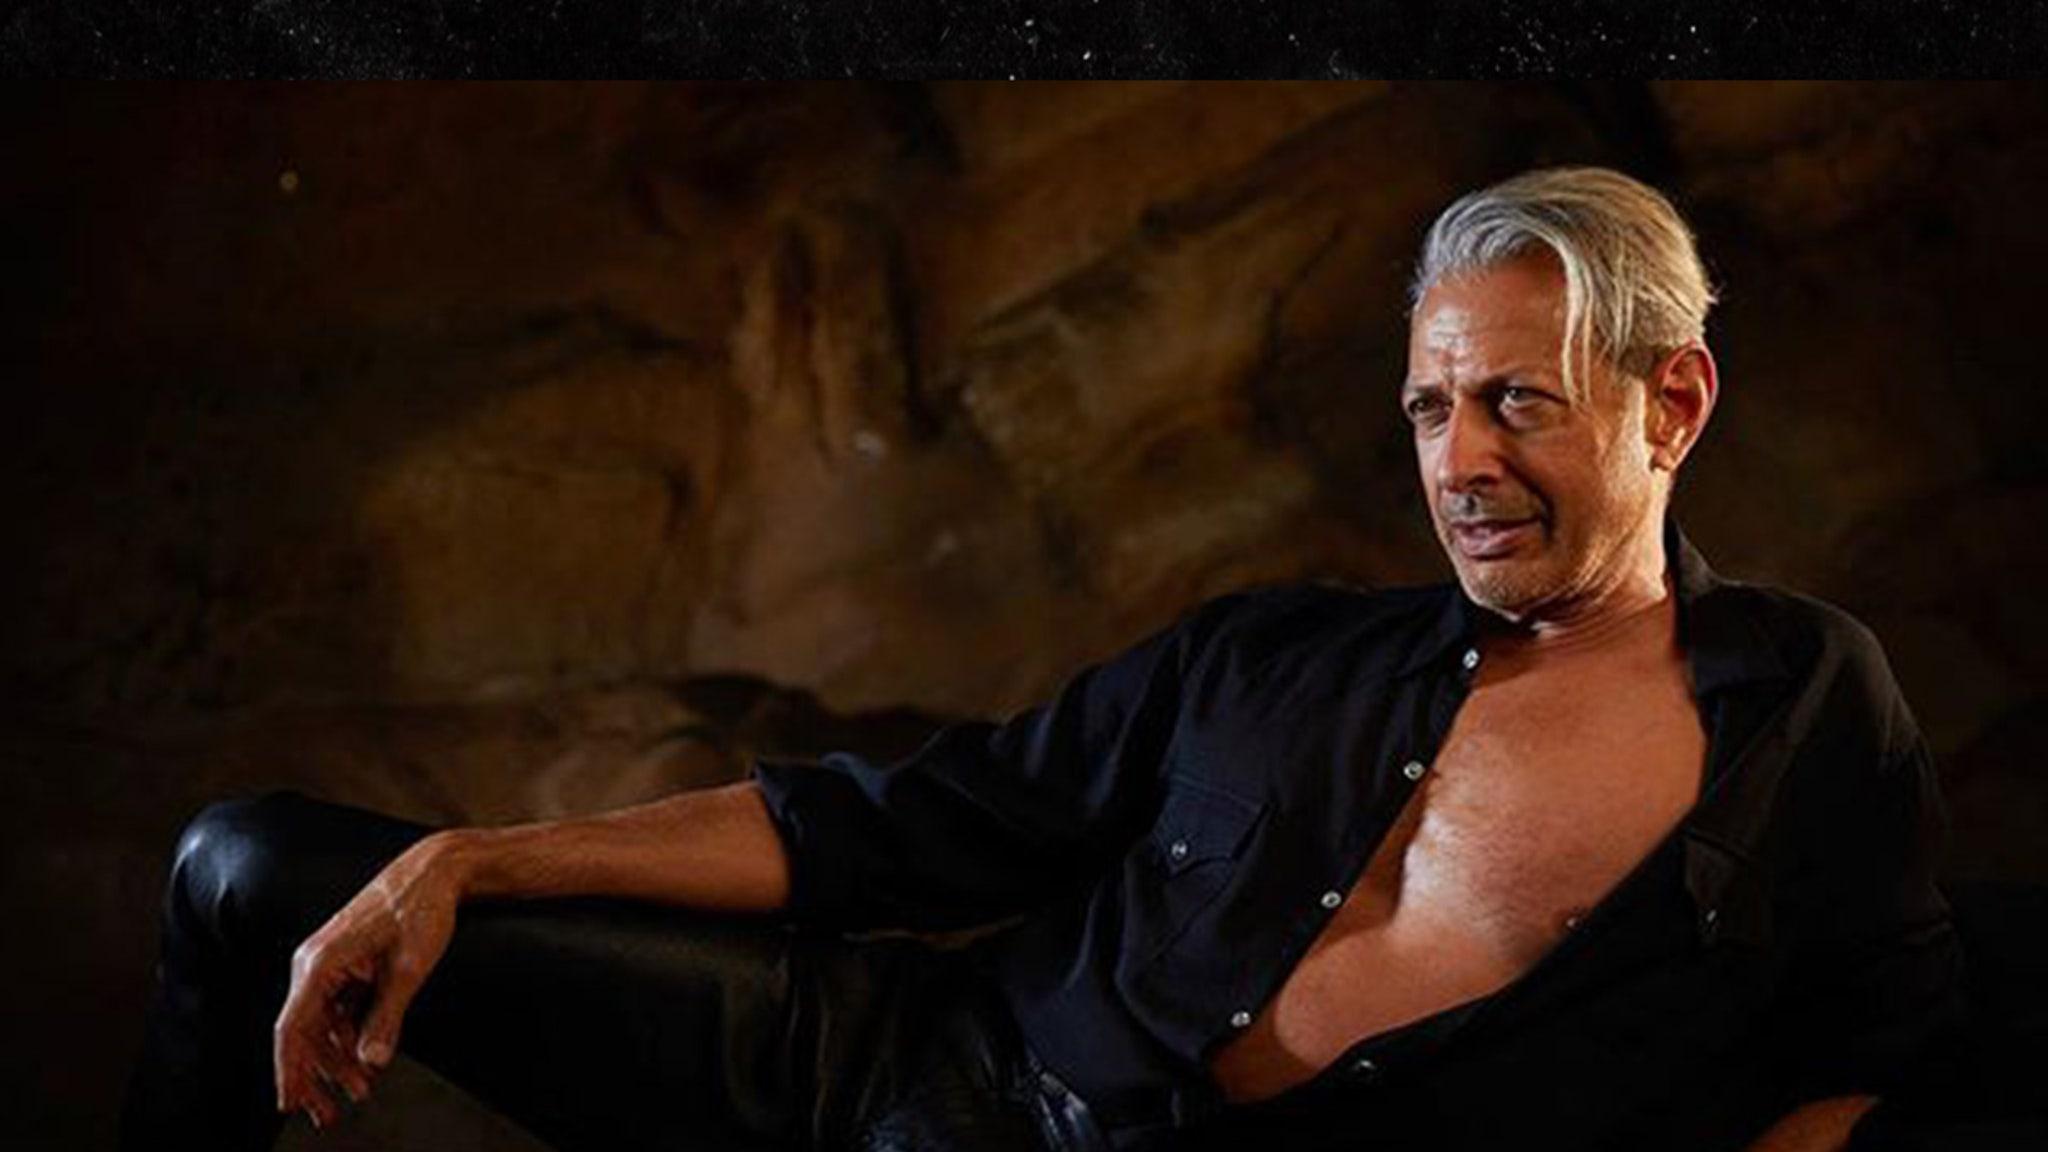 Jeff Goldblum Recreates Sexy 'Jurassic Park' Pose for Vote Campaign - TMZ